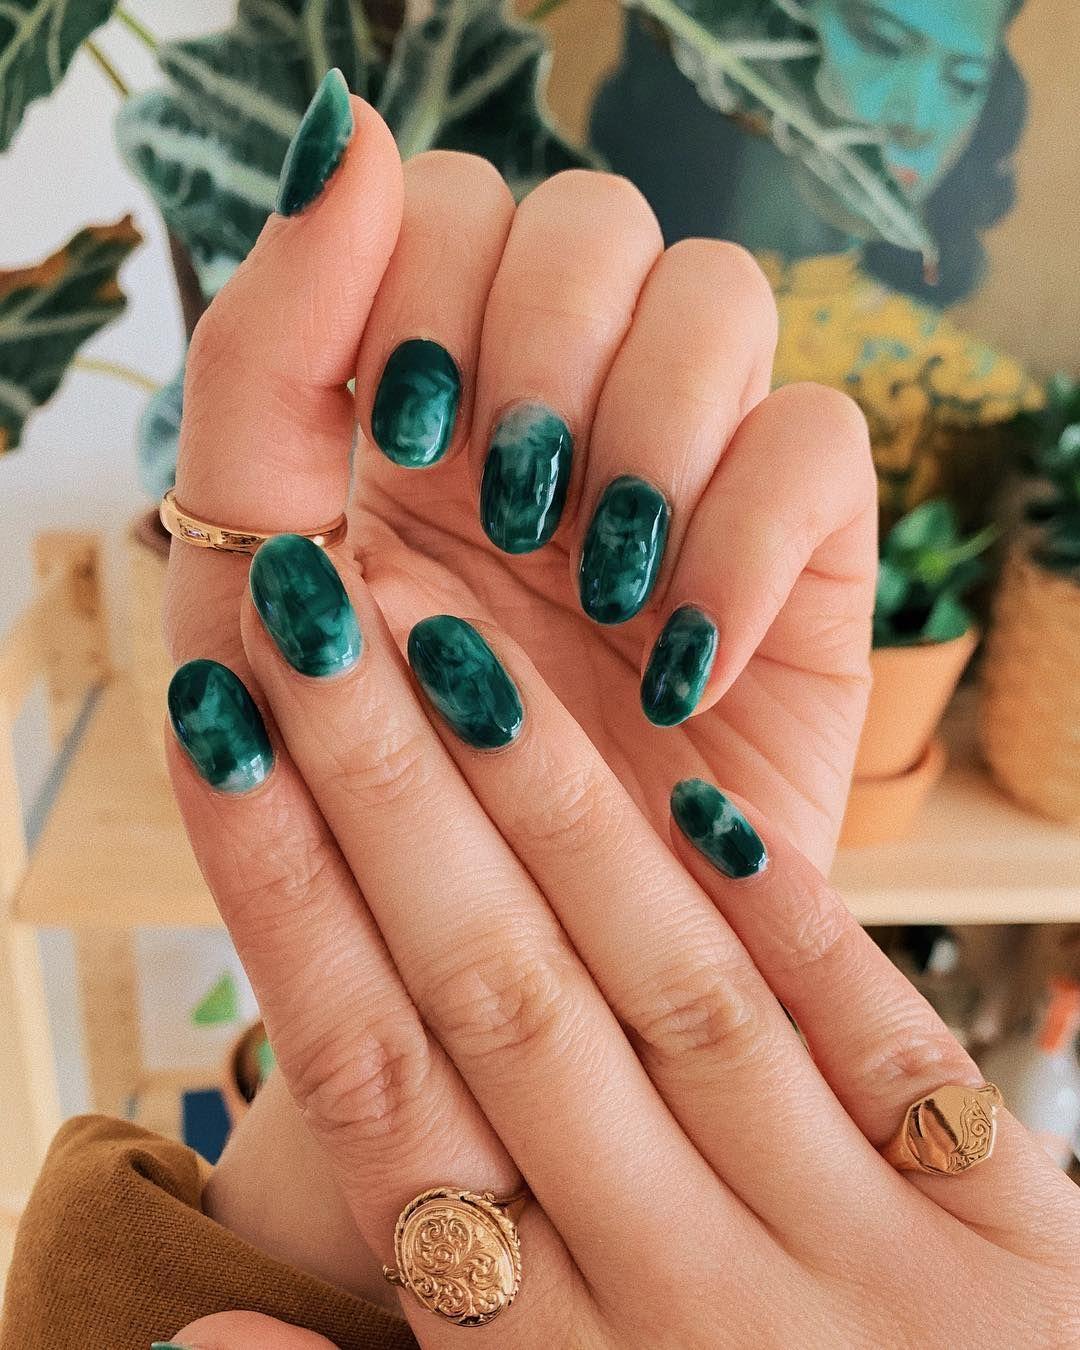 Green Marble Nails Gemstone Mani Gel Bottle Natural Nailfie Green Nails Green Nail Designs Nails